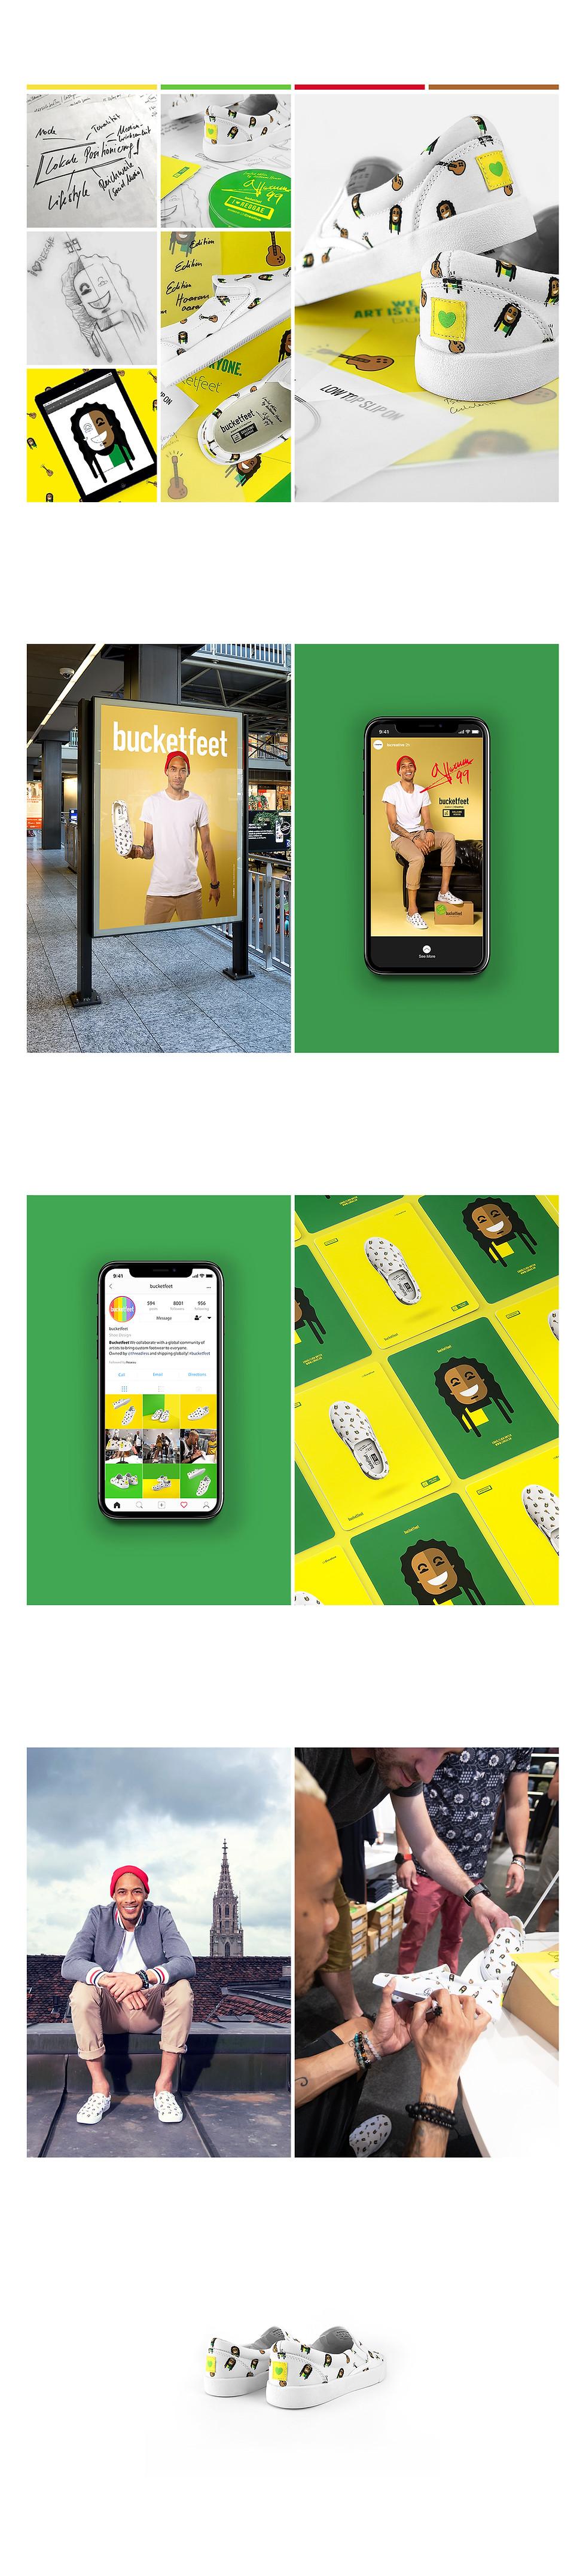 bucketfeet-hoarau-branding-design_03.jpg